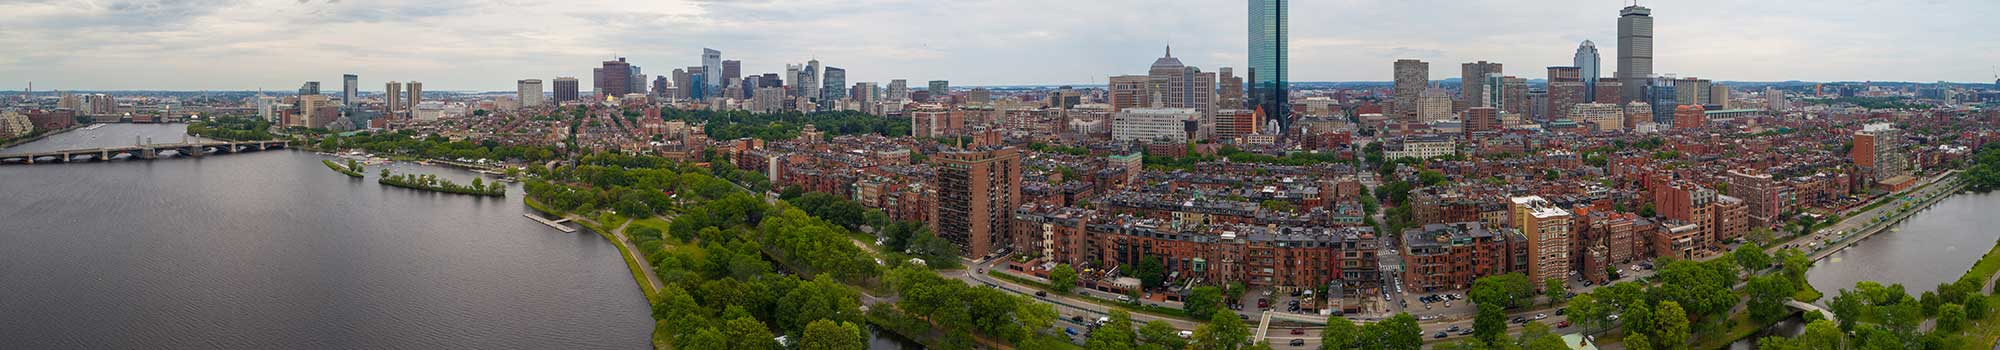 boston urban development